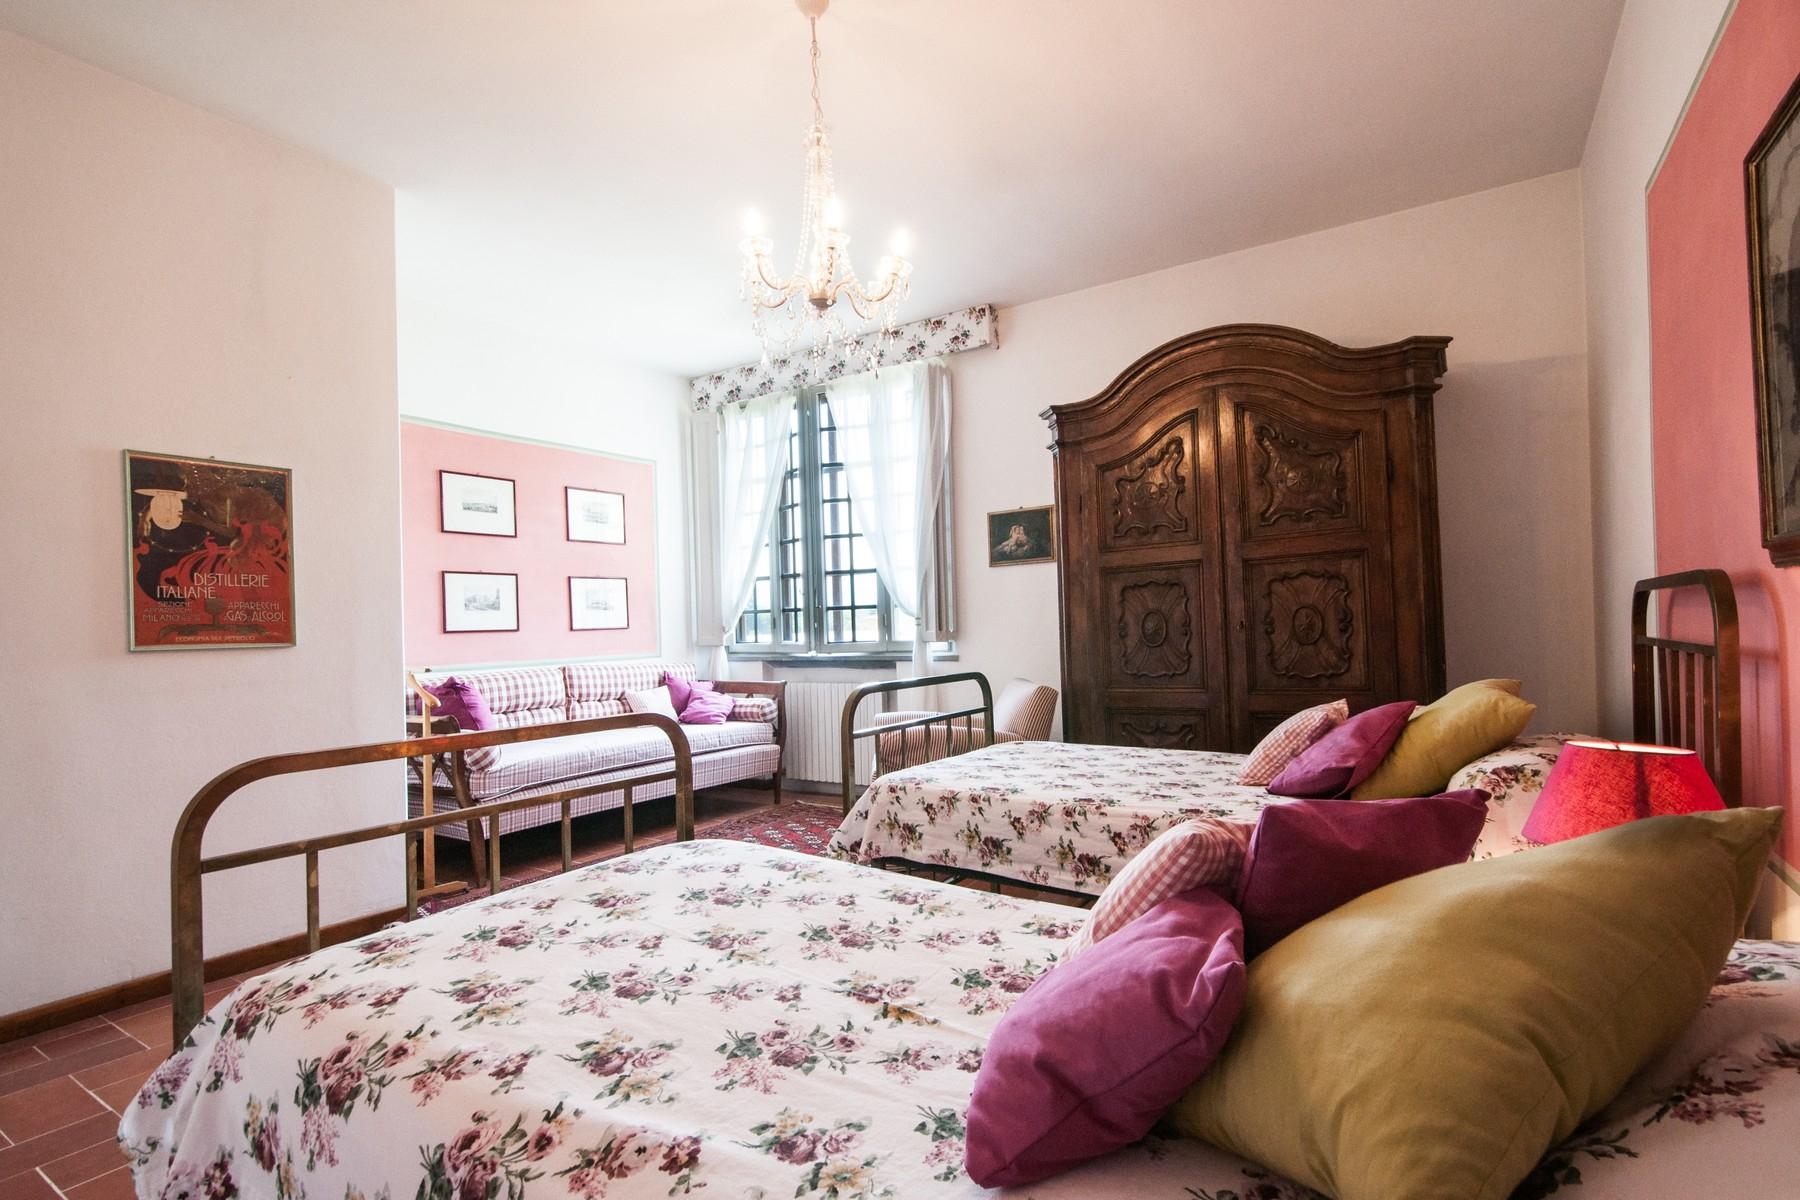 Villa in Vendita a Lucca: 5 locali, 400 mq - Foto 9